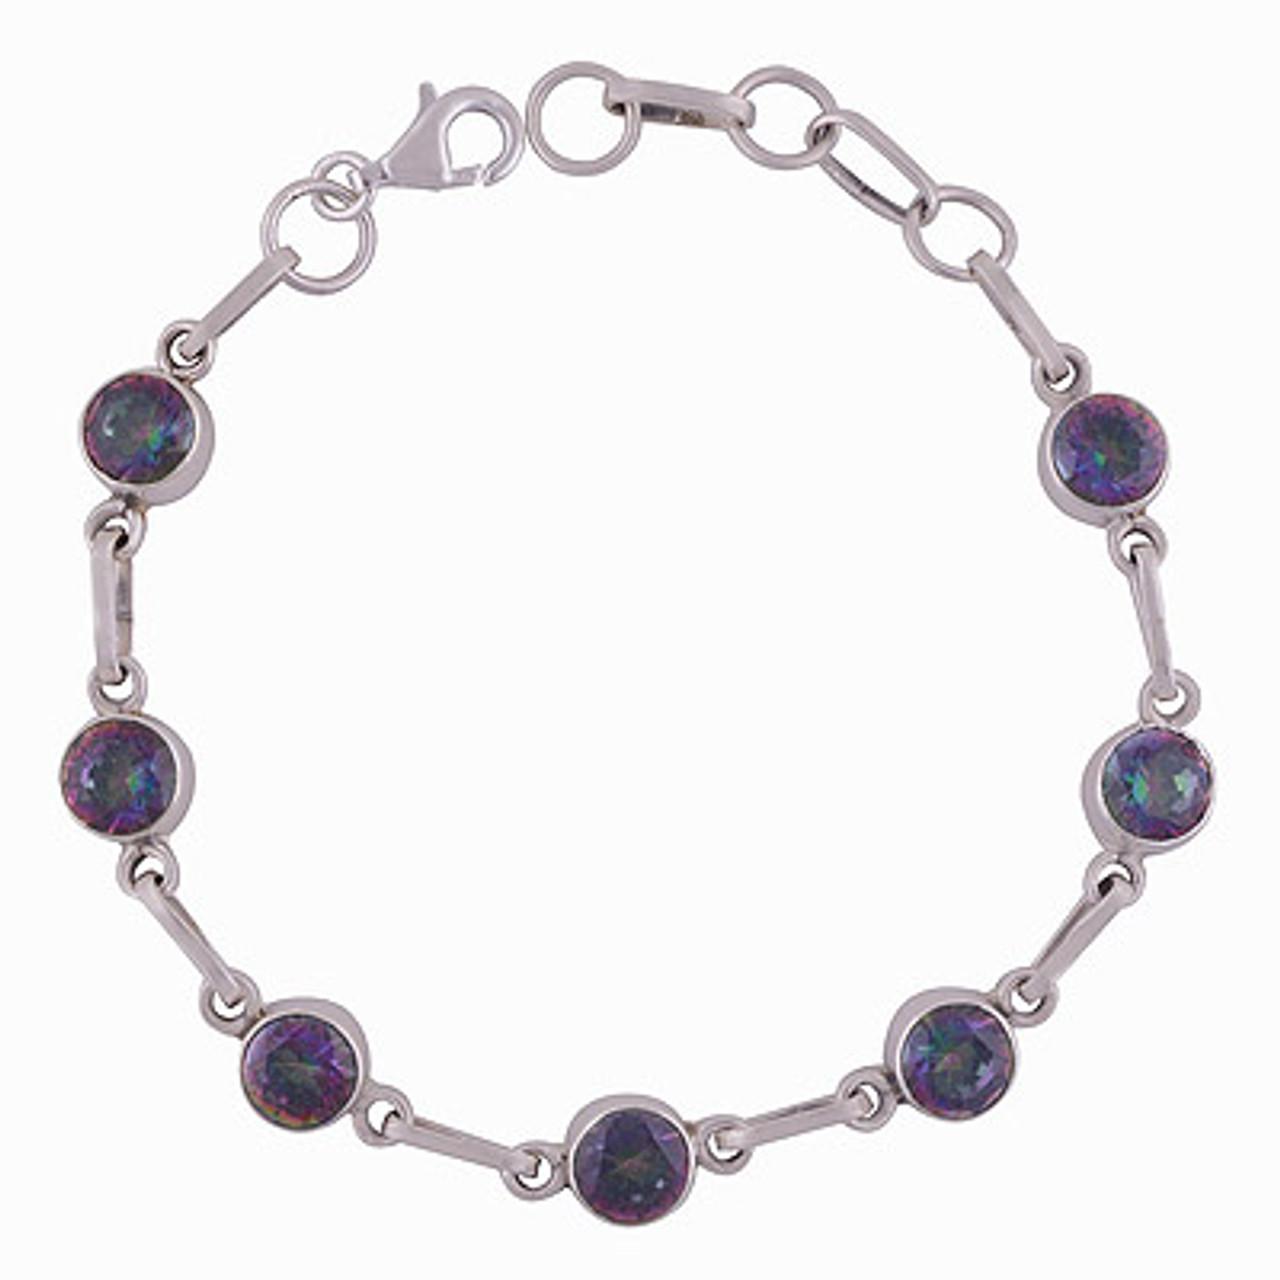 Petite Mystic Topaz All in One Silver Bracelet